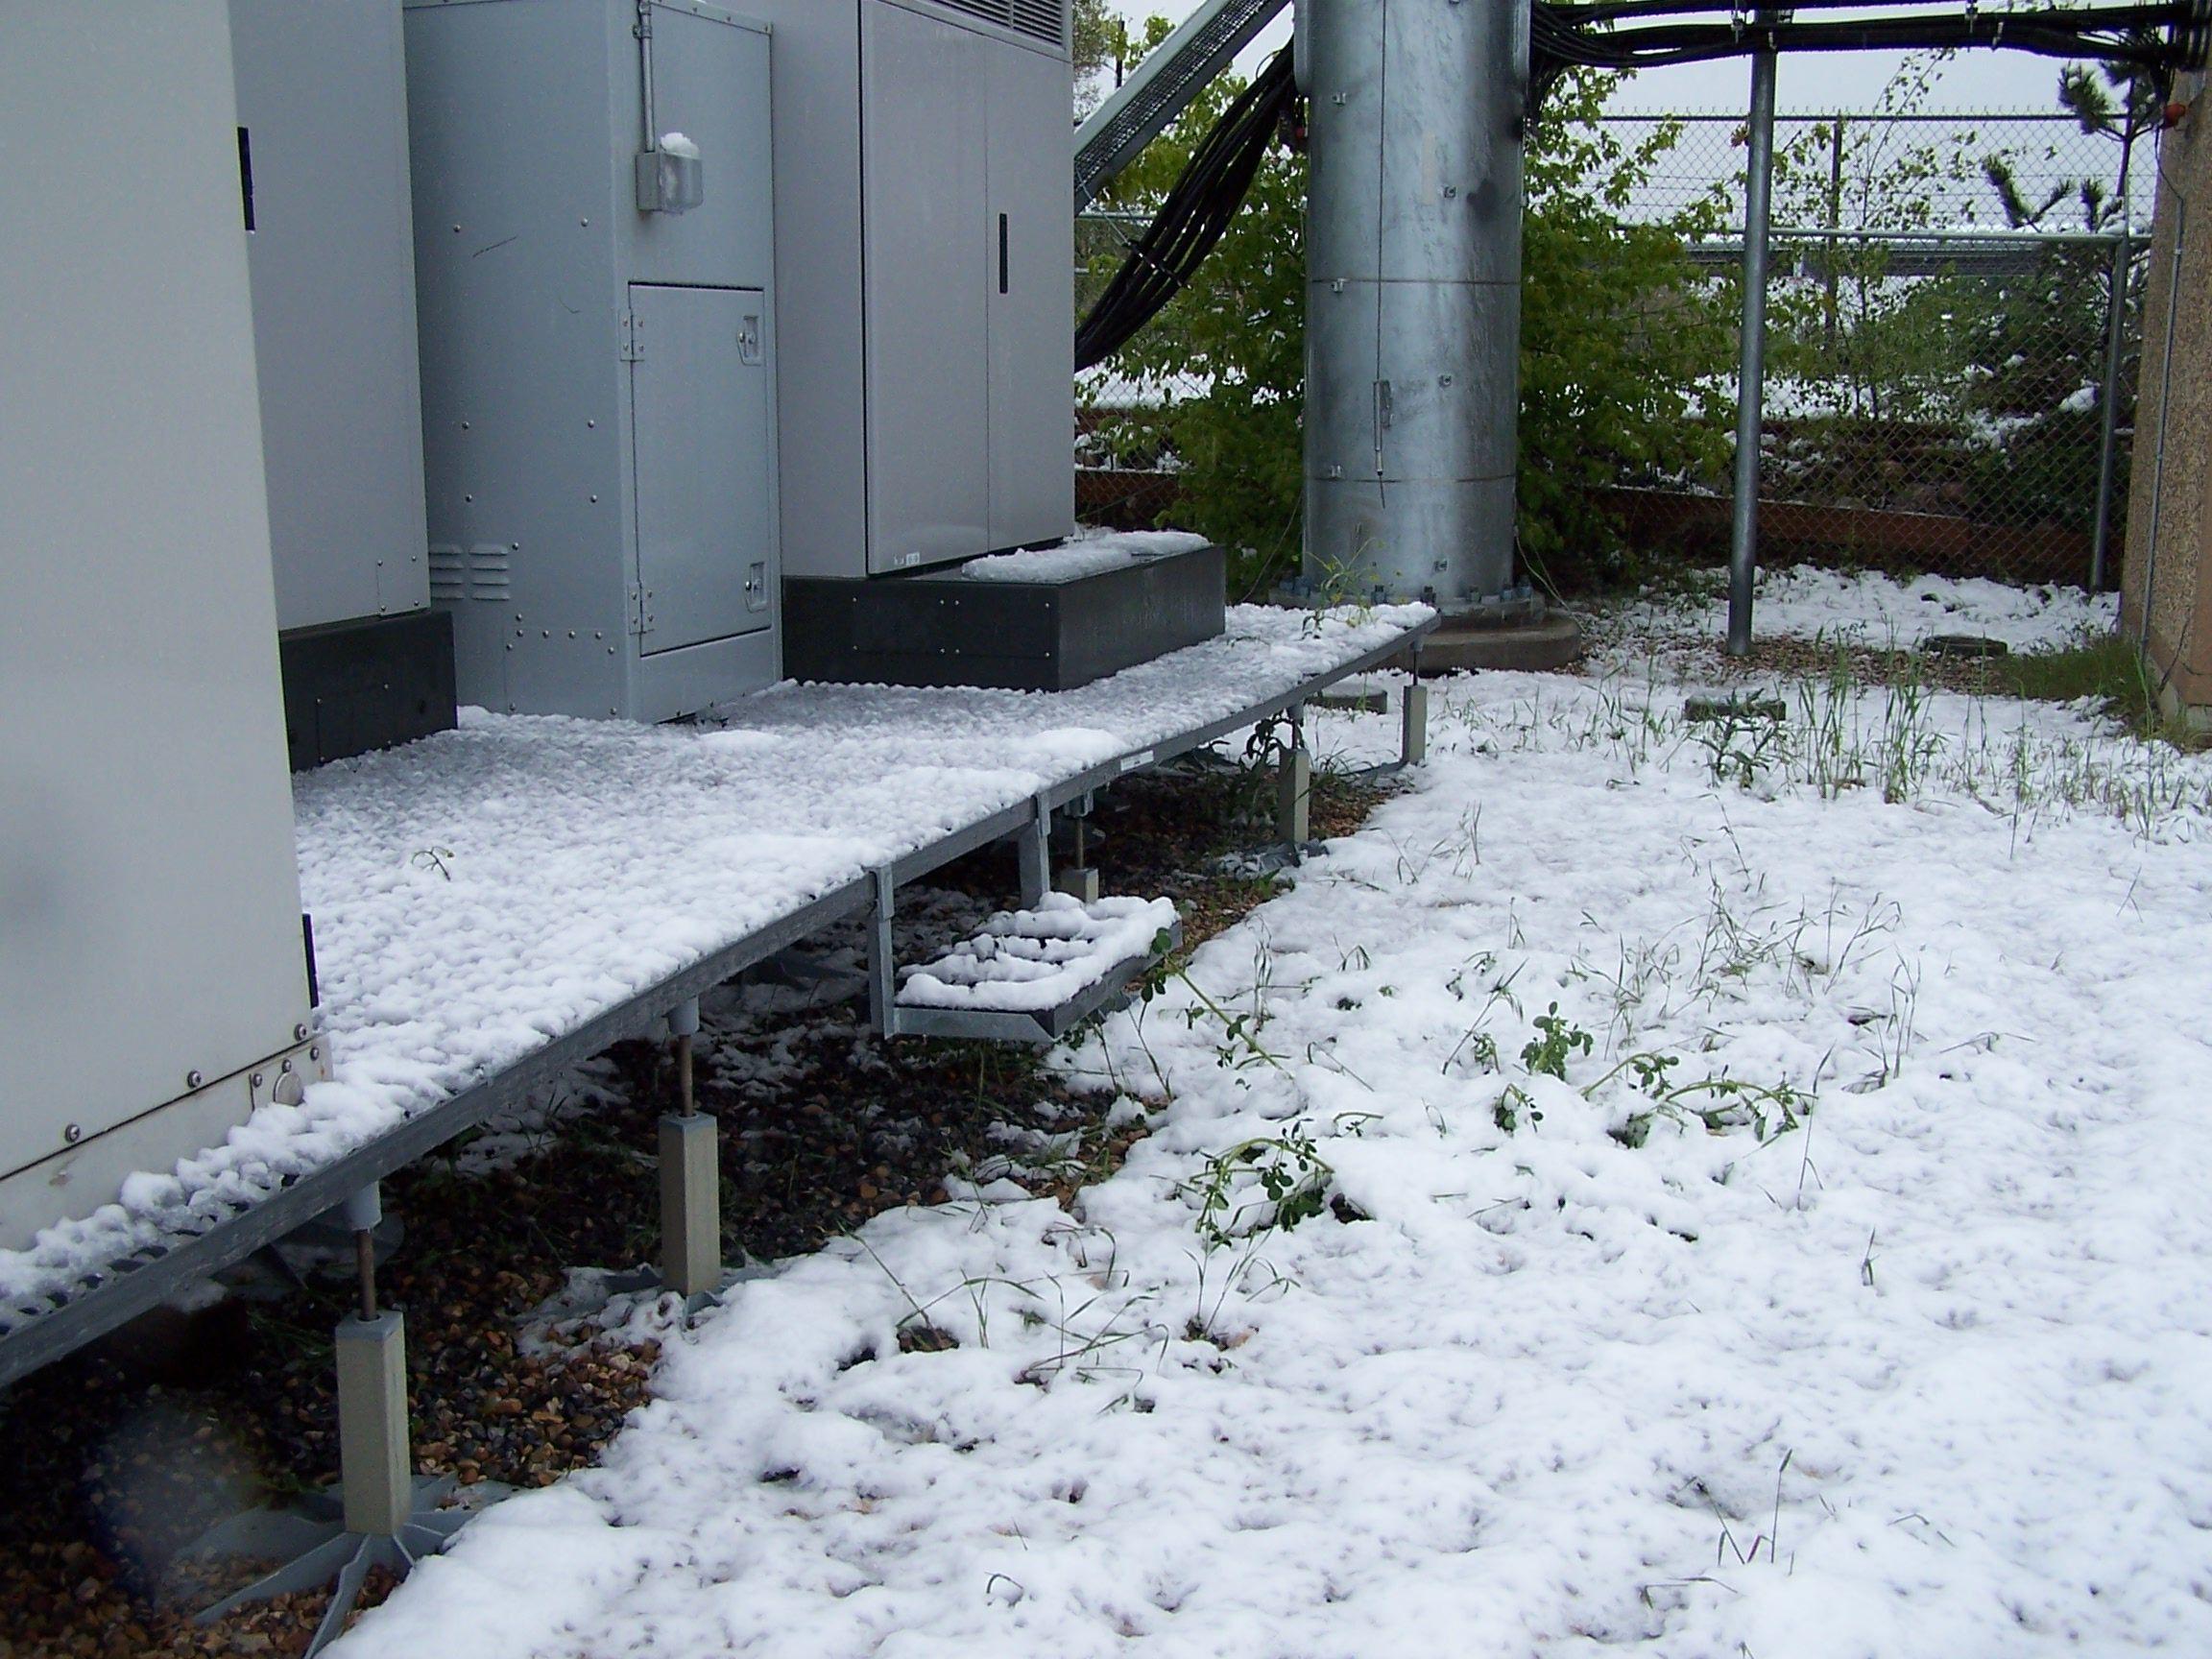 Grating Piso aisla Generadores Nieve